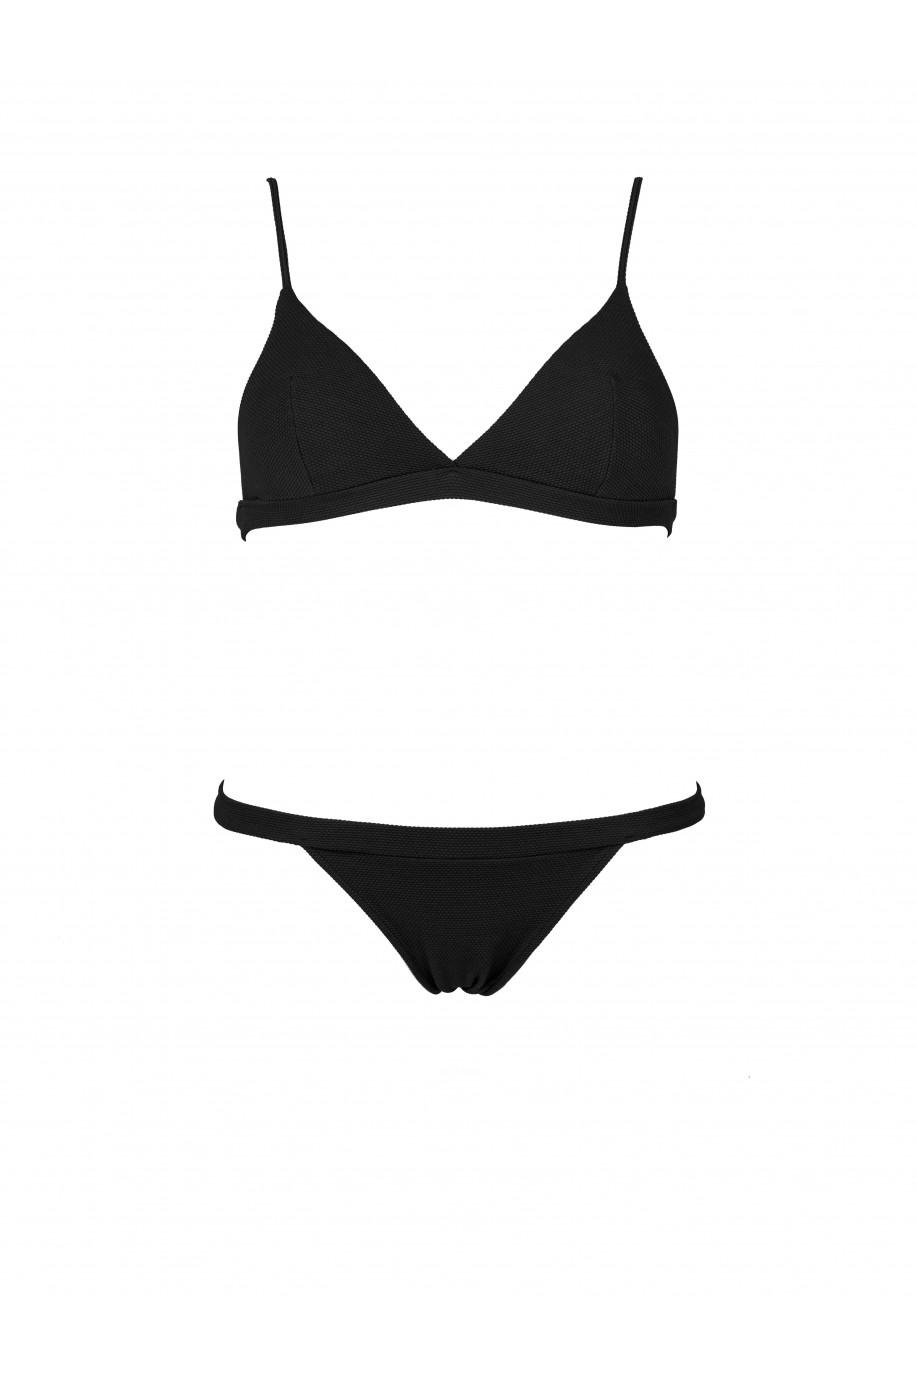 All Black Pique Sporty Bikini